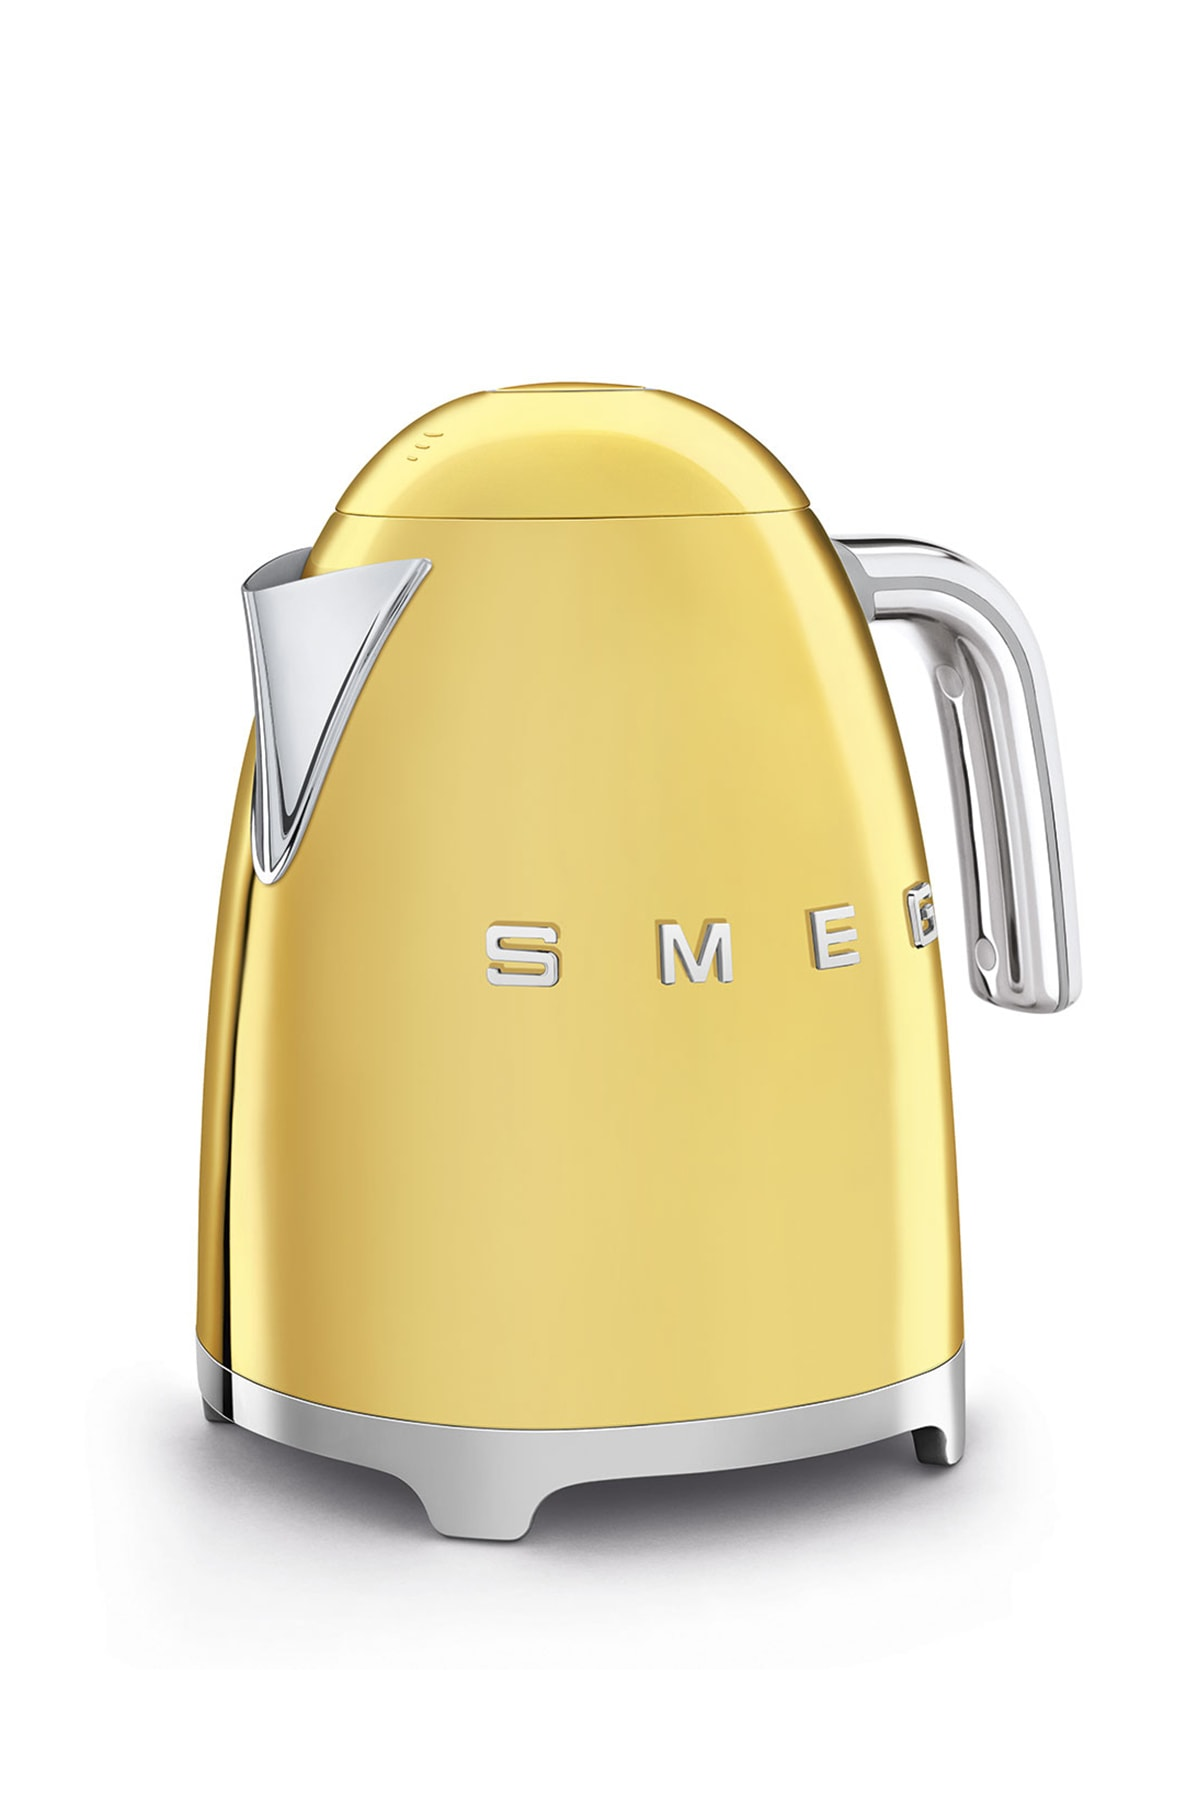 SMEG Altın Rengi 50's Style Kettle Klf03goeu 2